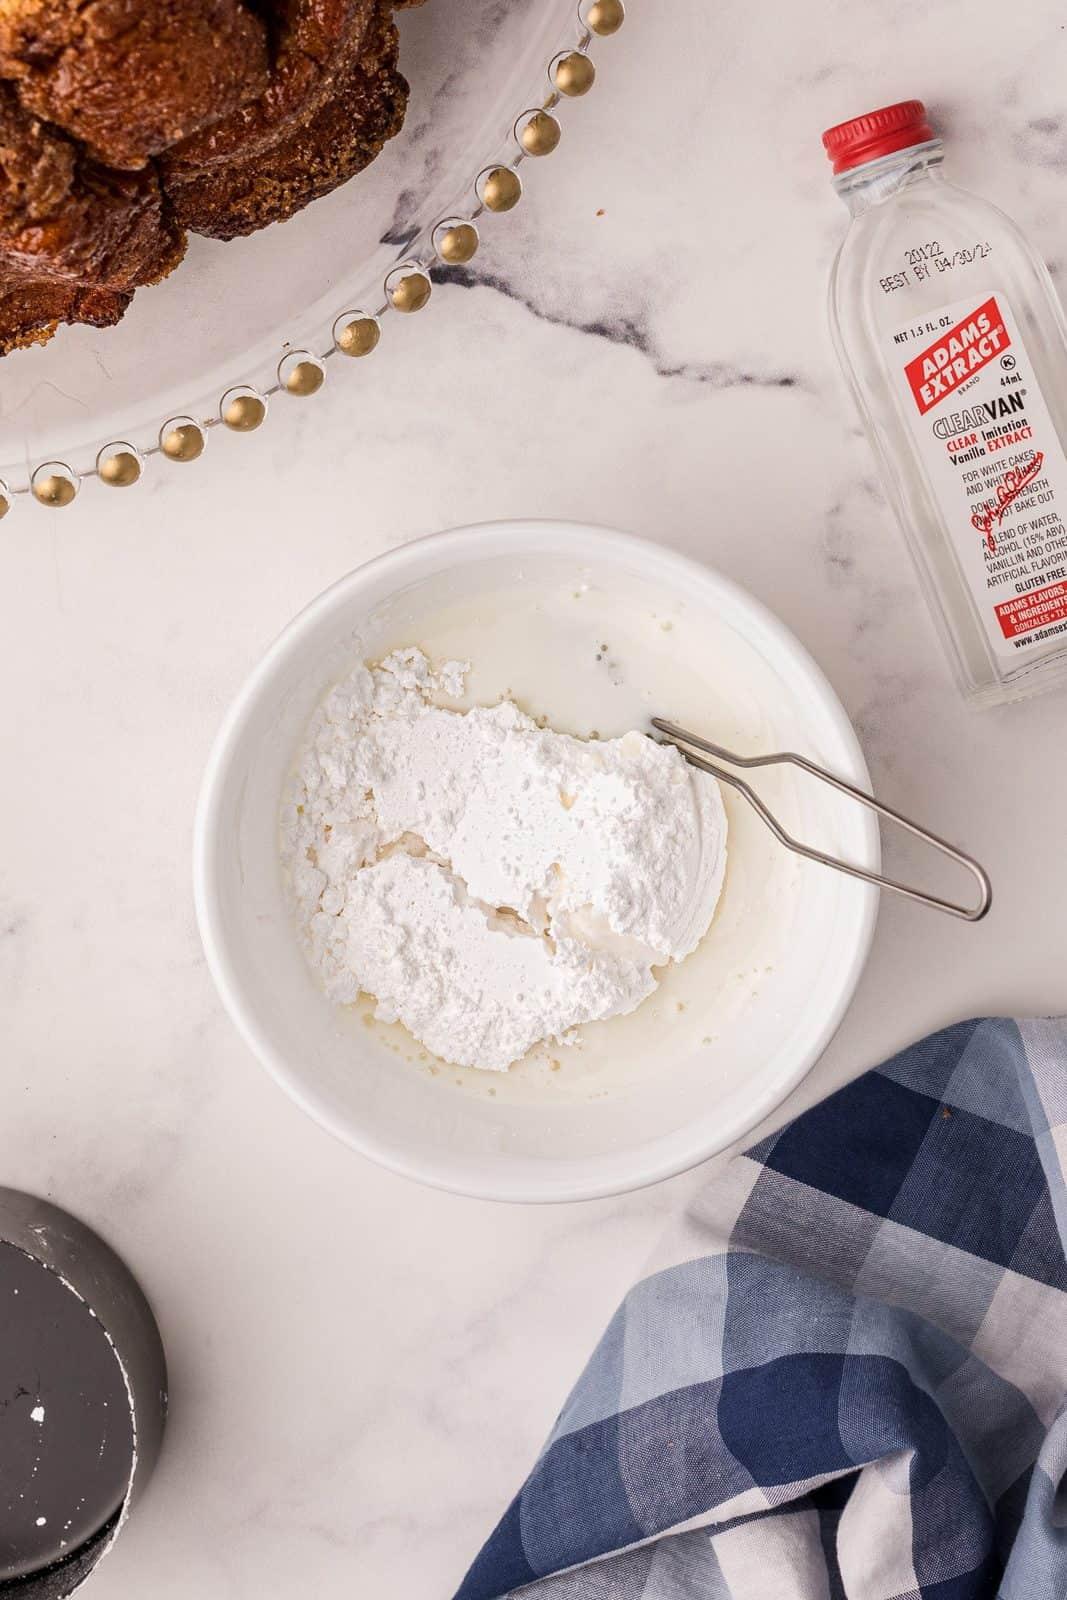 Glaze ingredients in bowl.